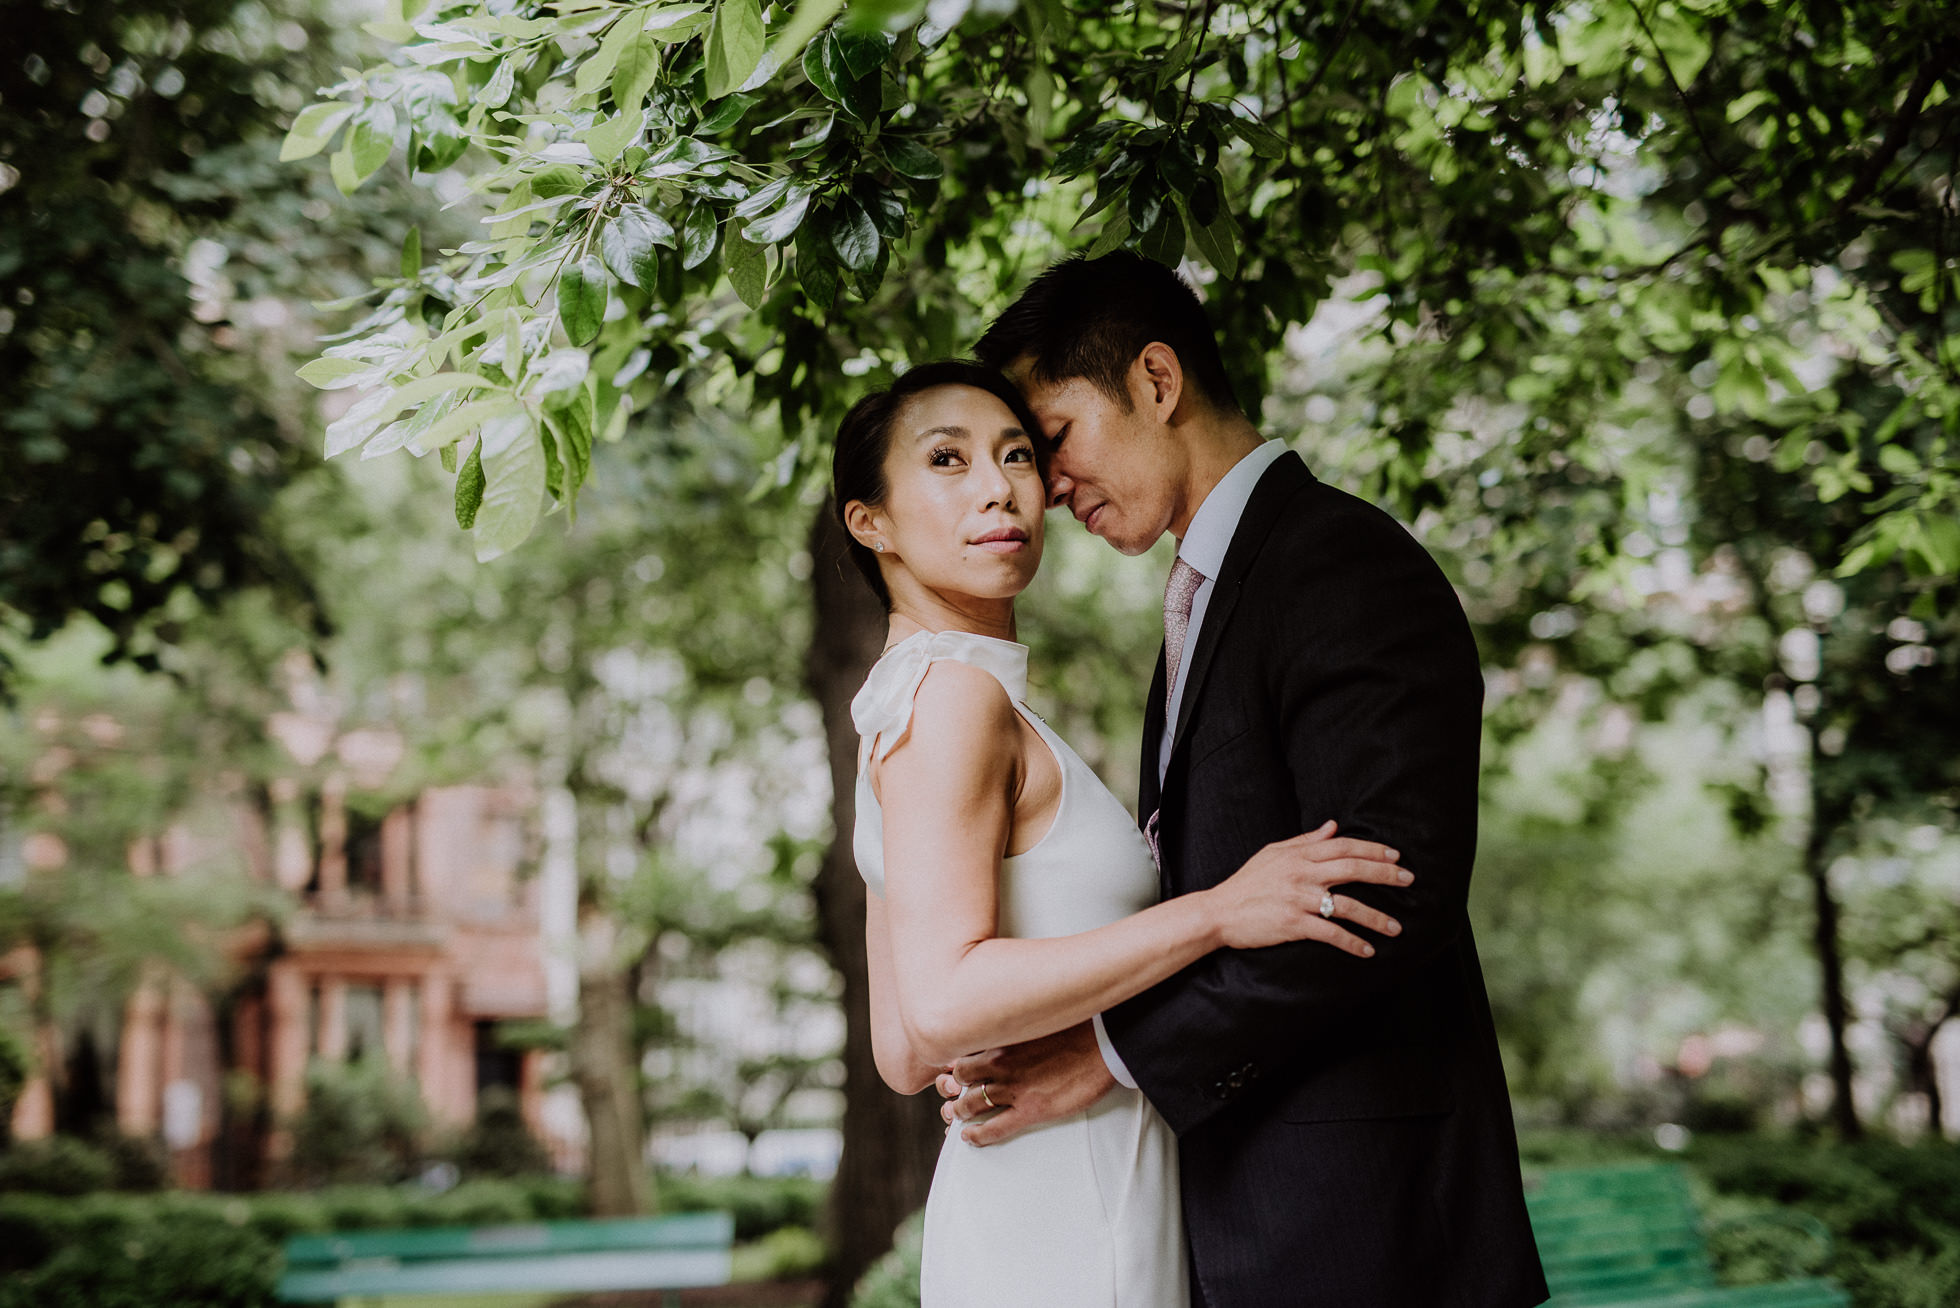 Gramercy Park engagement photos